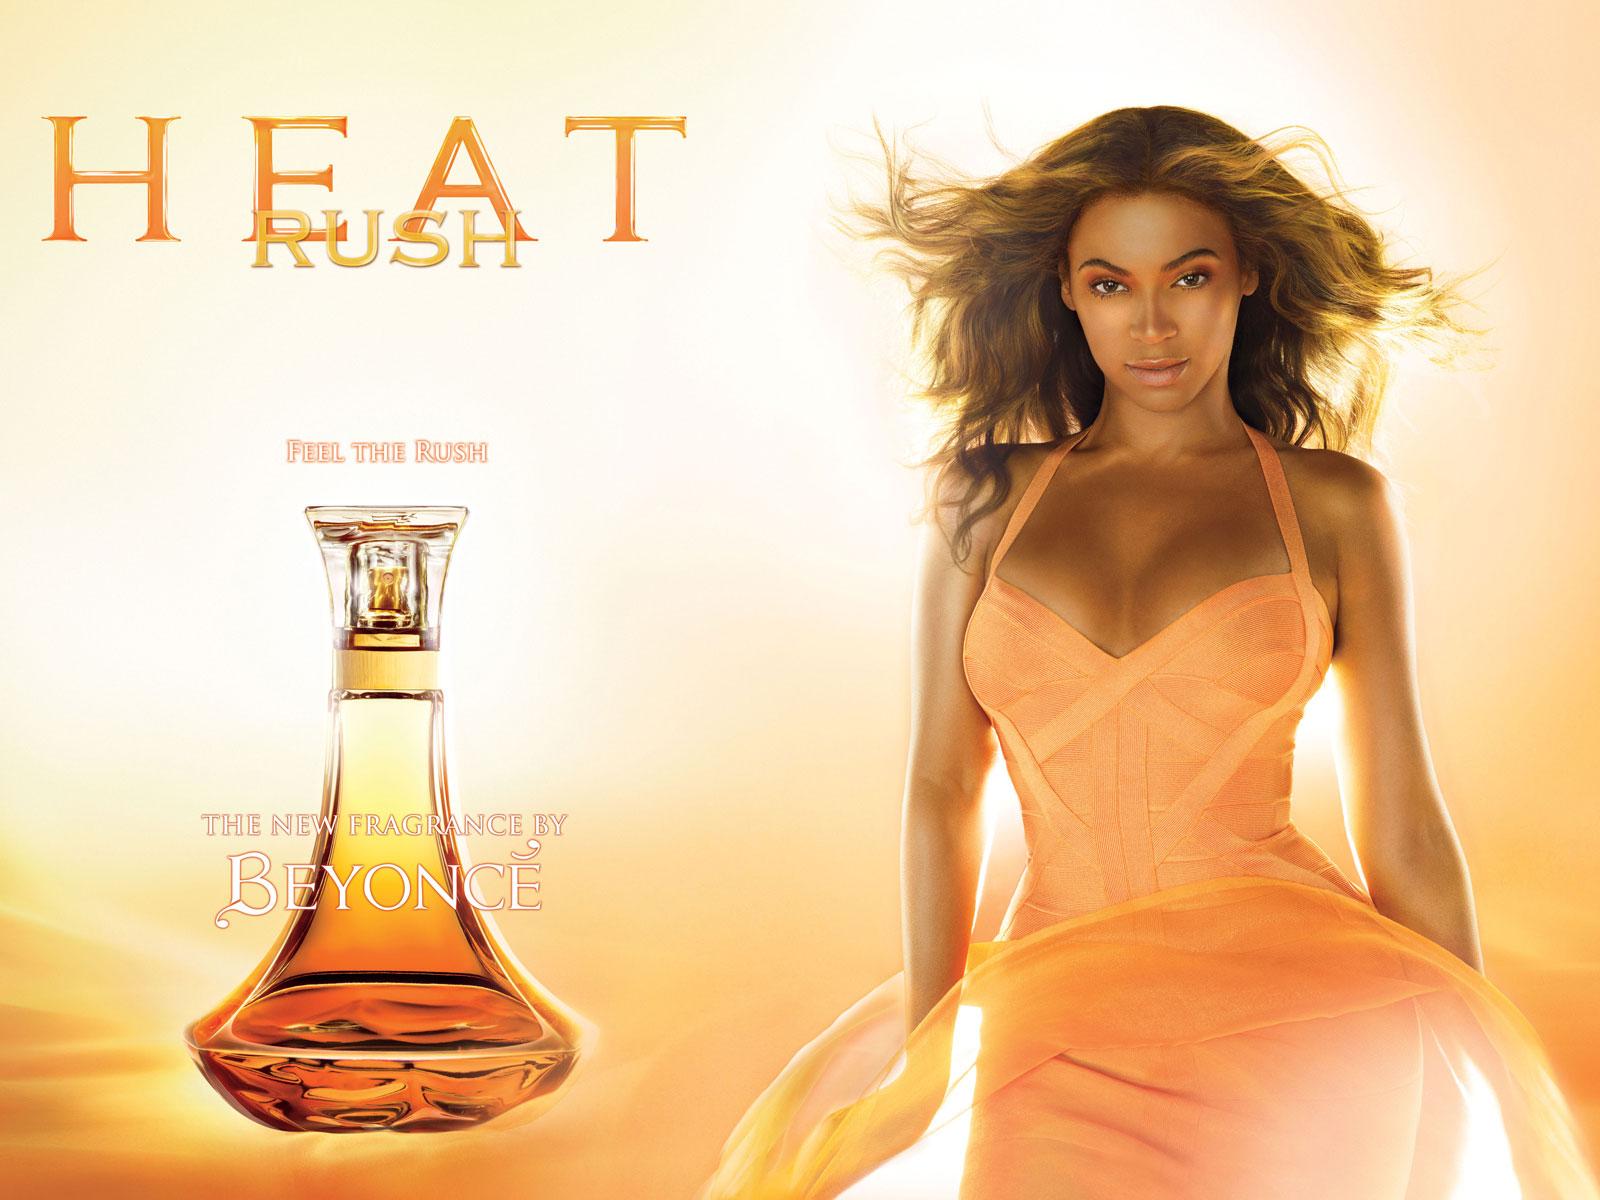 Beyonce's Heat Rush Perfume